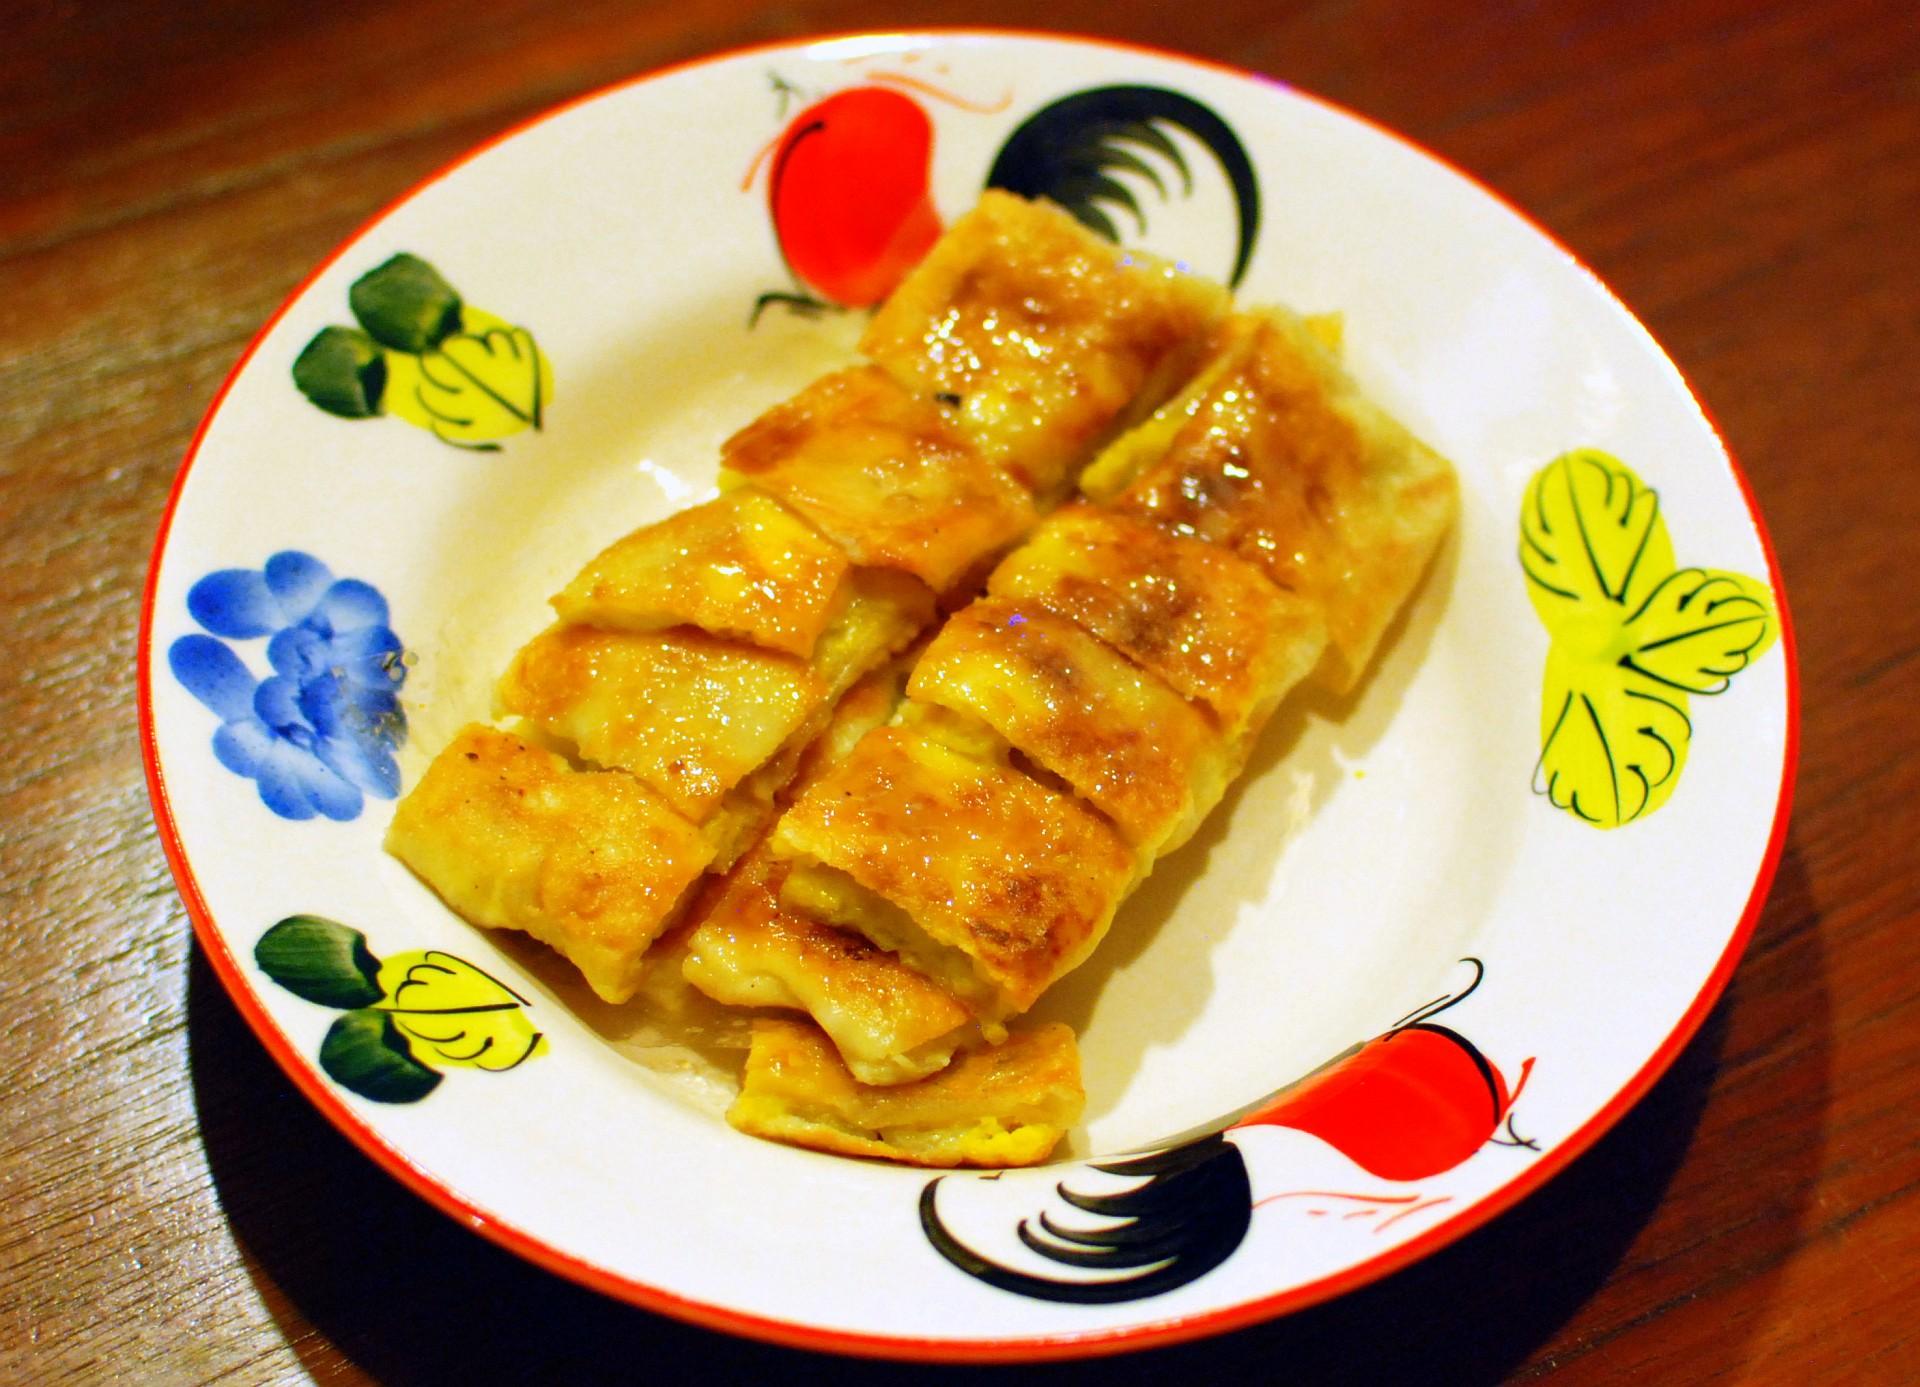 File:Roti kluai khai chiang mai 04.jpg - Wikimedia Commons